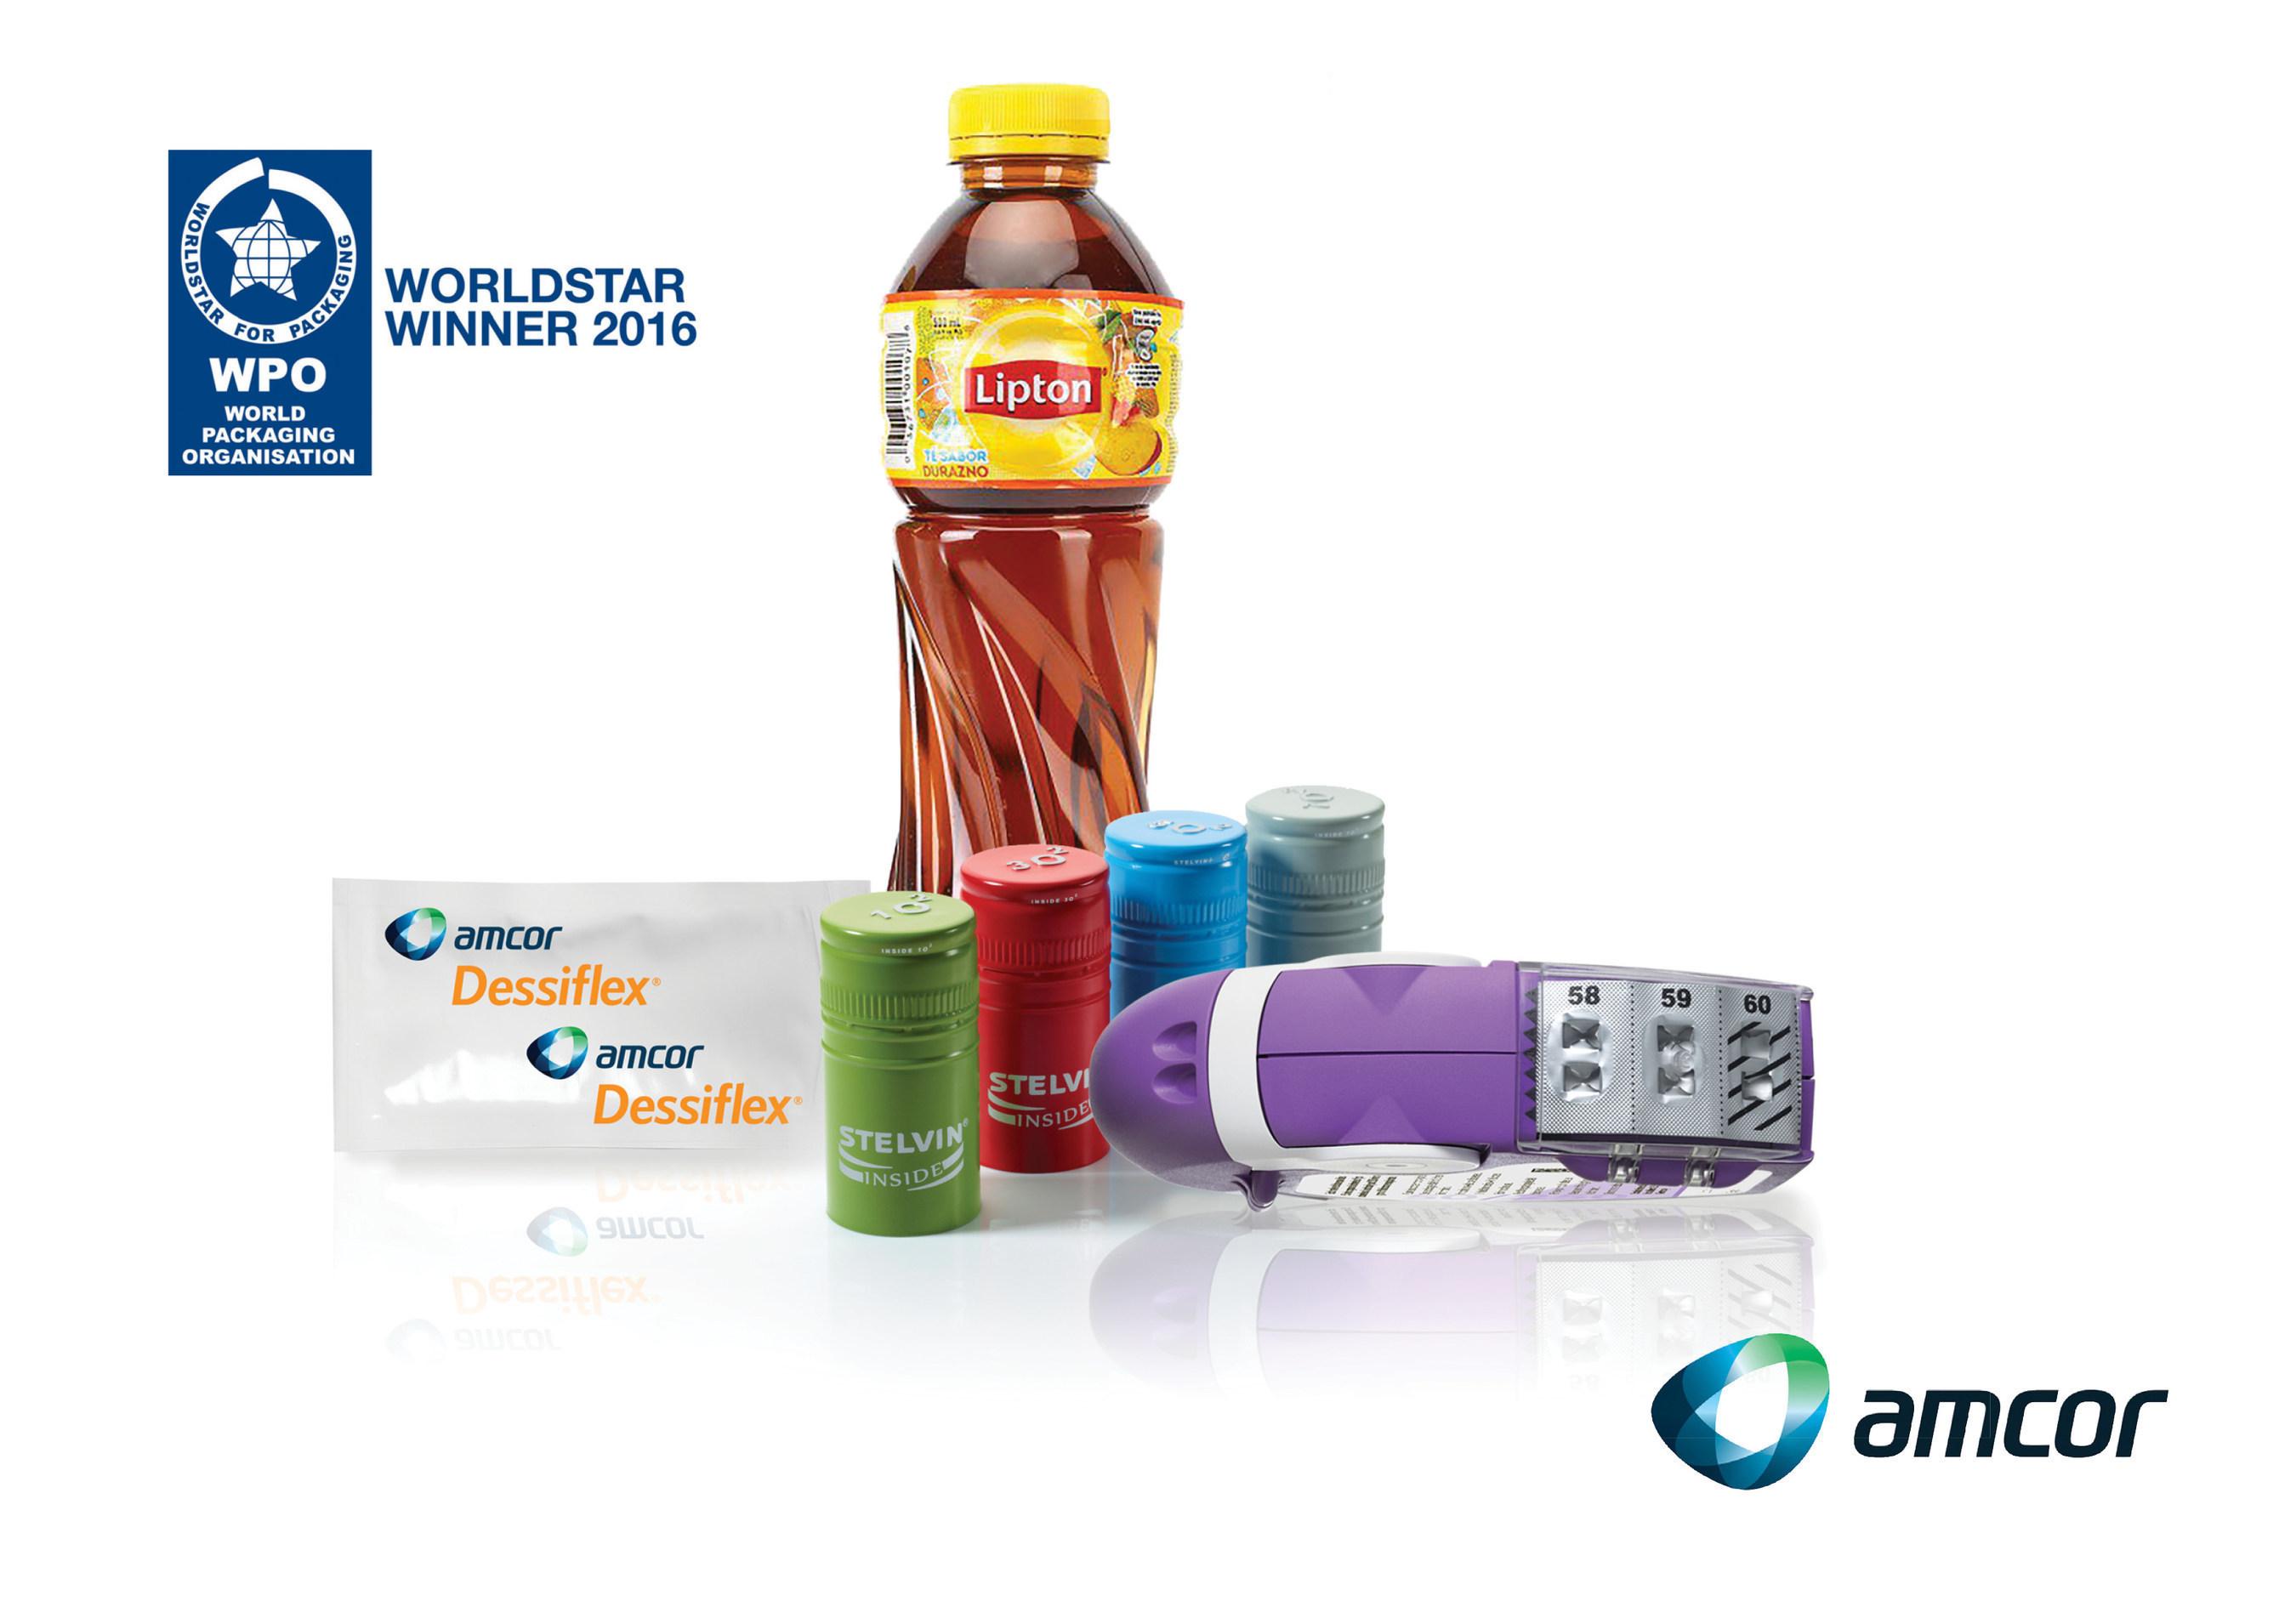 Amcor receives four WorldStar Awards for packaging design innovations